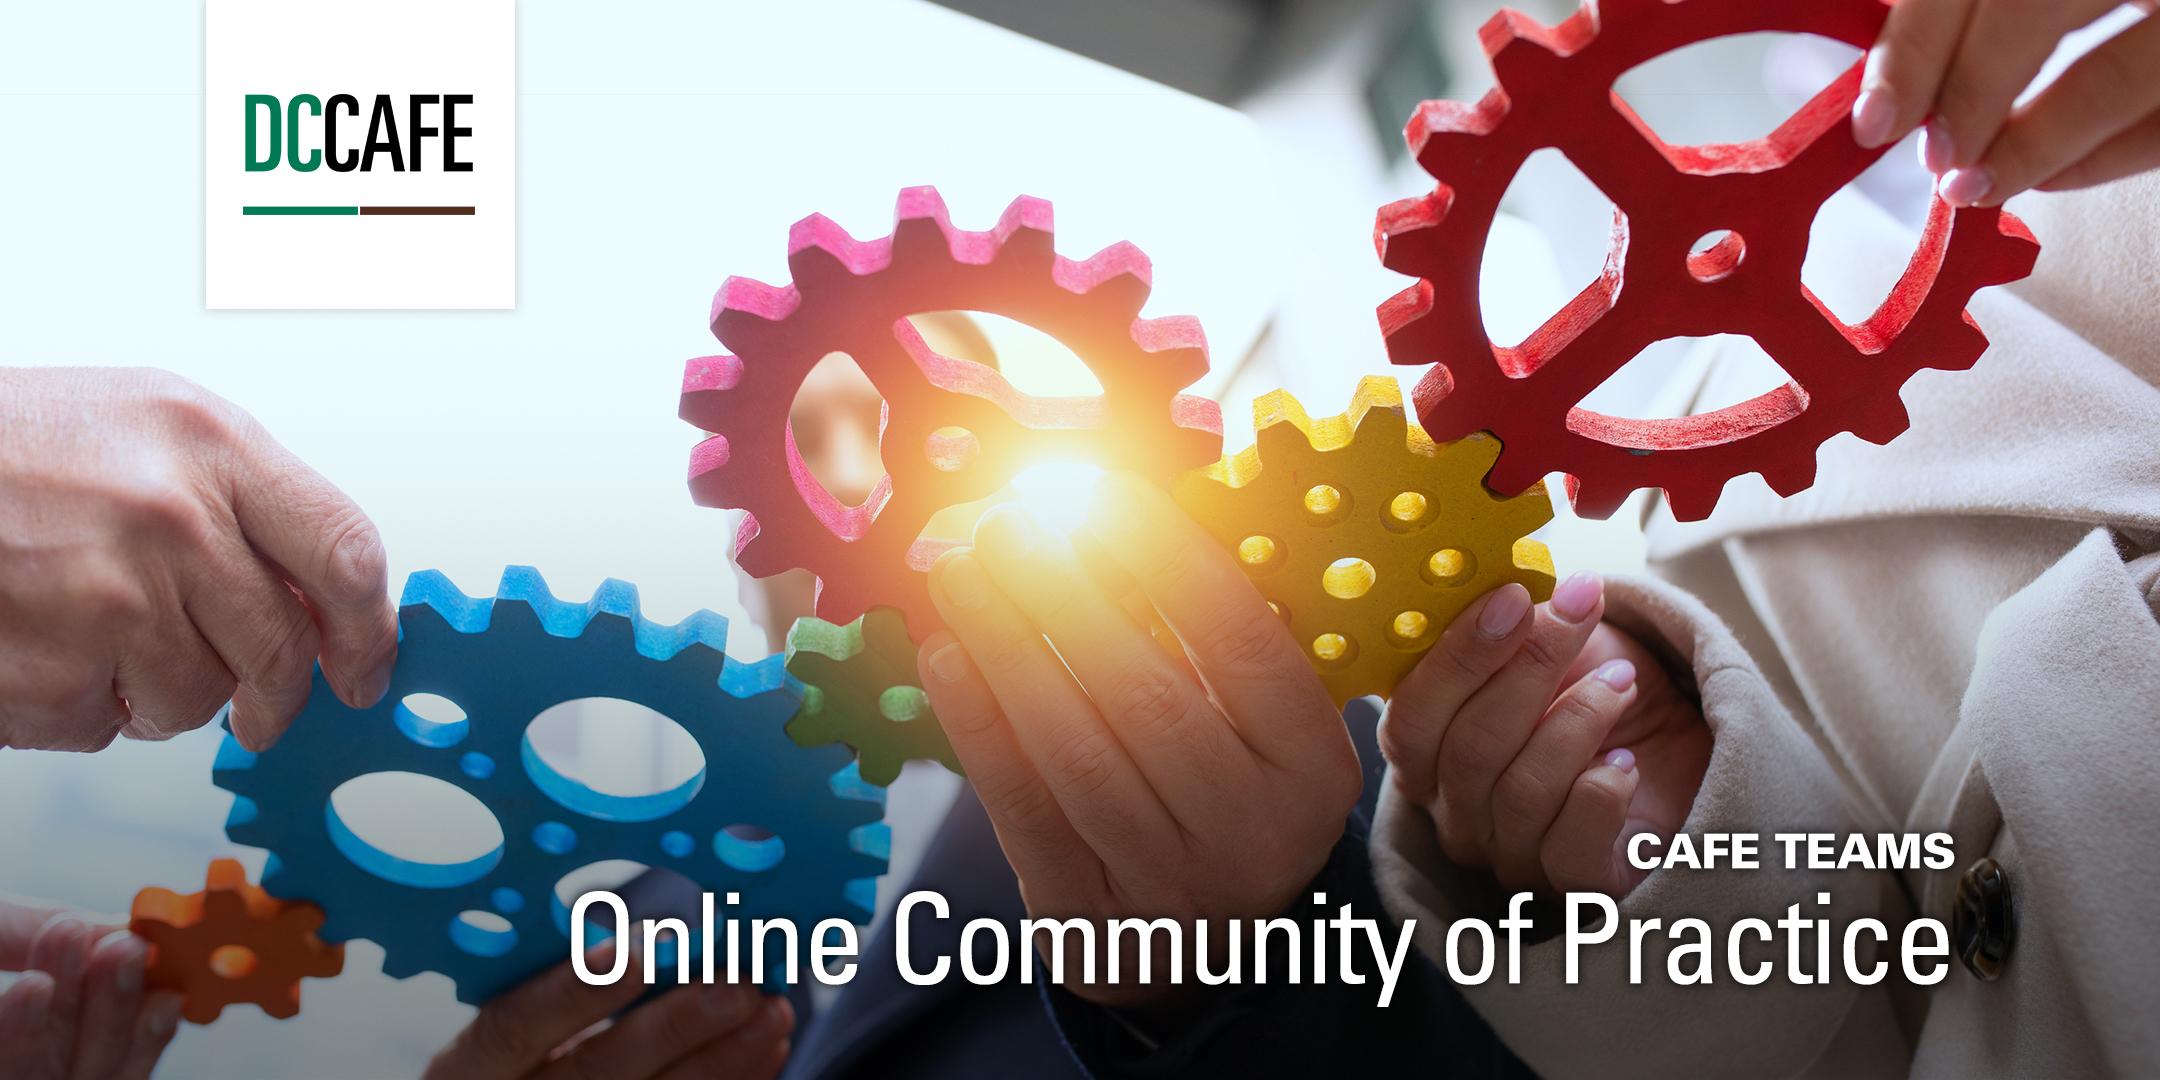 CAFE Teams - Online Community of Practice